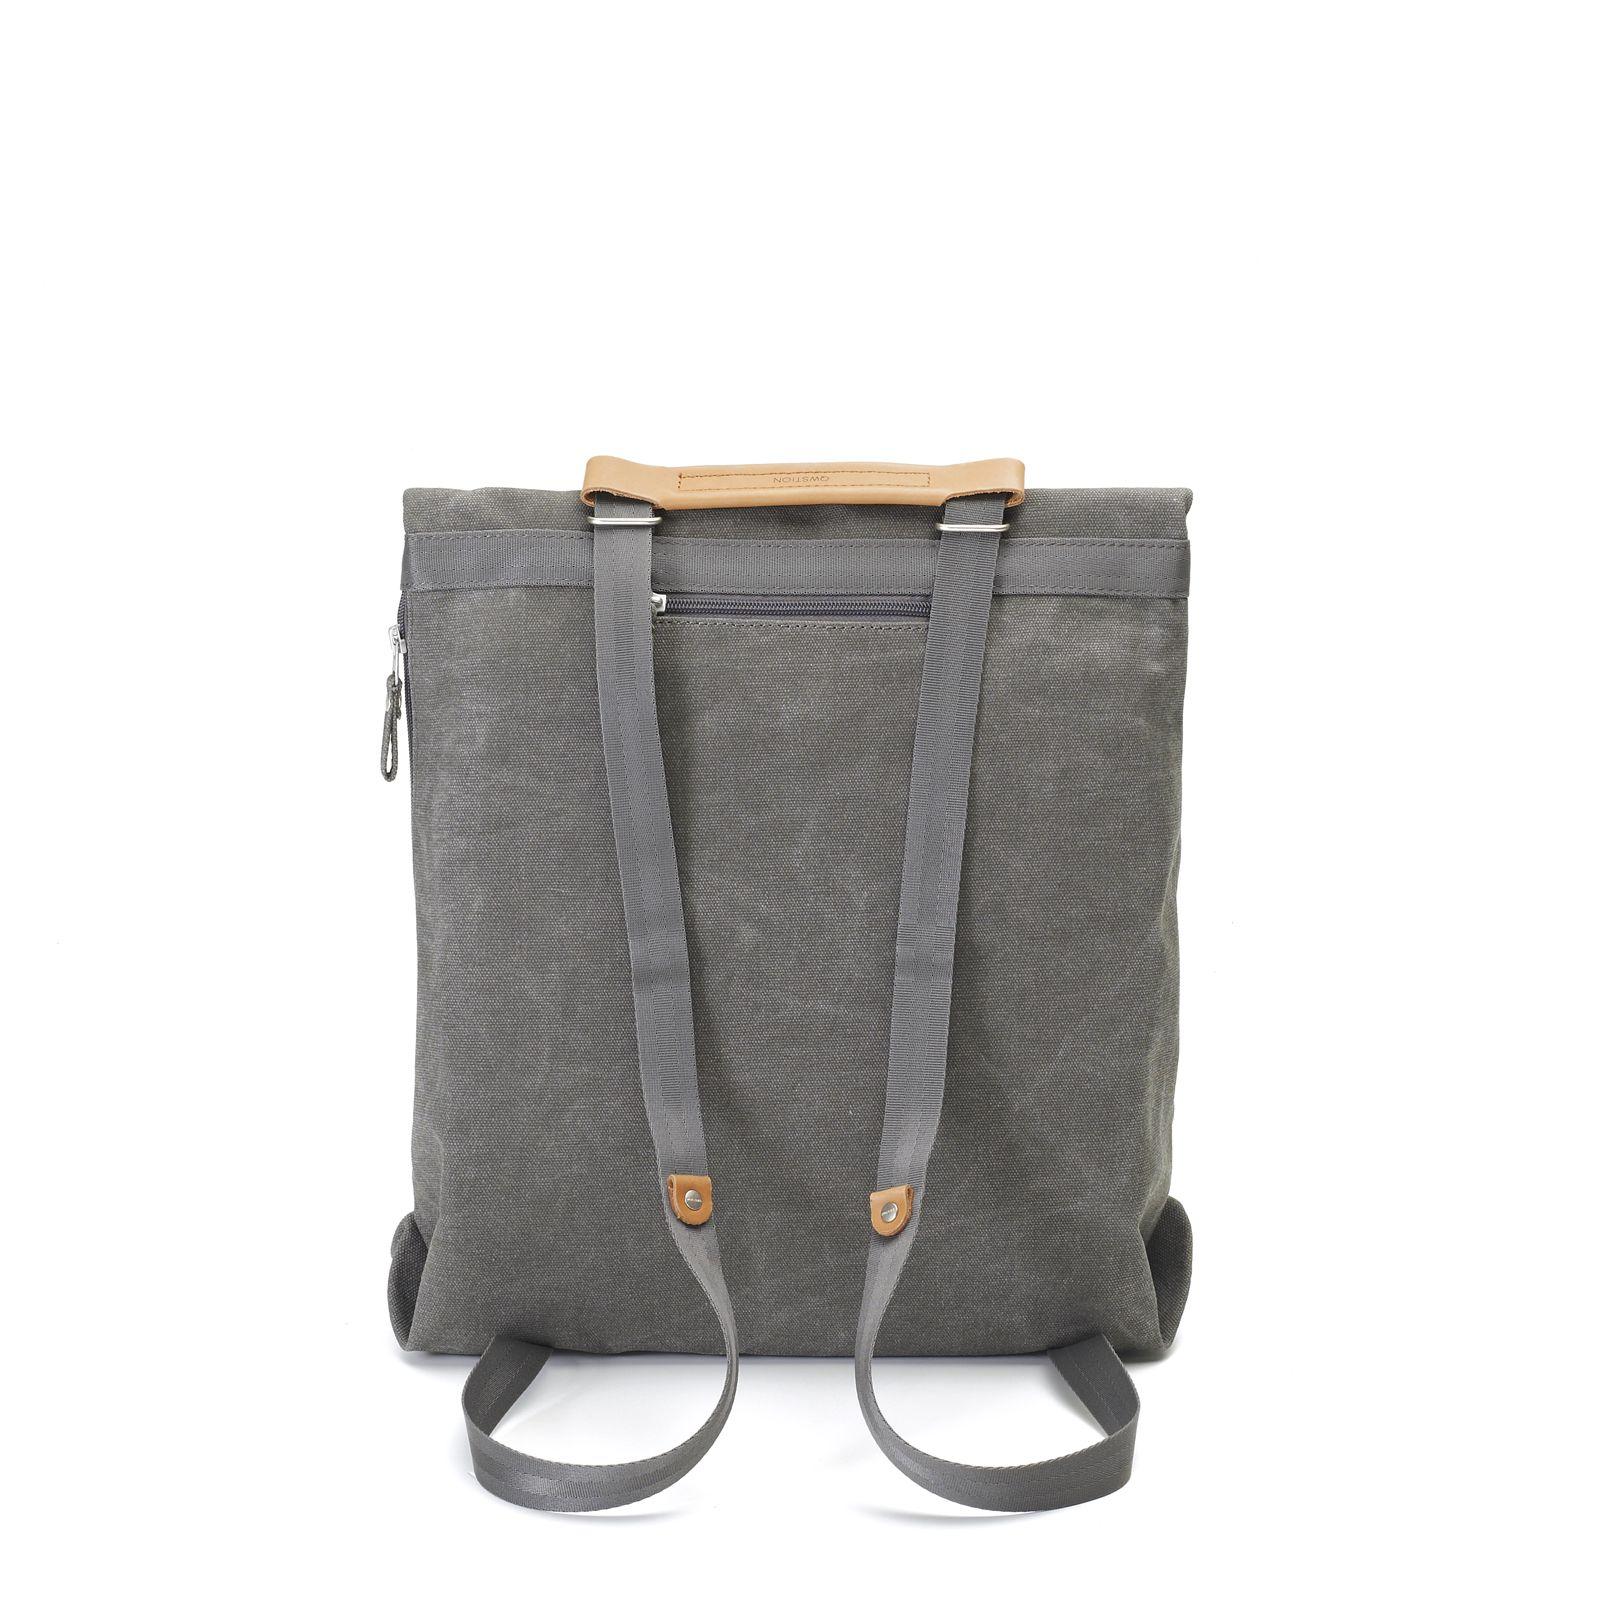 Tote - Organic Washed Grey